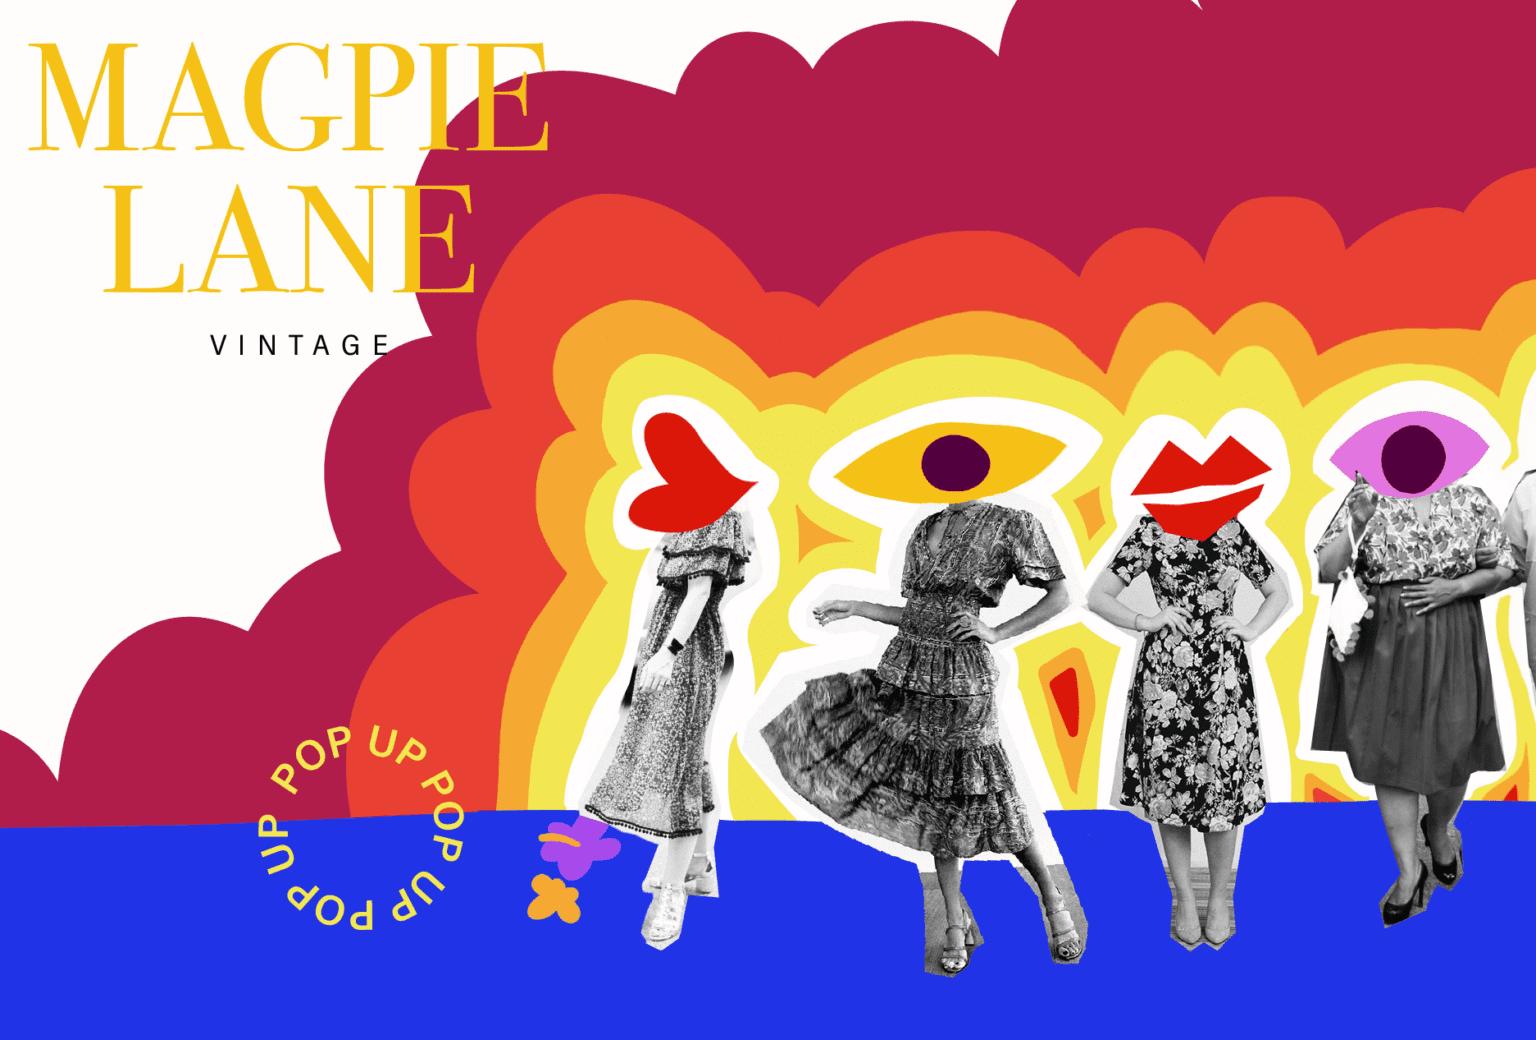 Historisk modeshow og popup butik med Magpie Lane på Tekstilmuseet i Herning